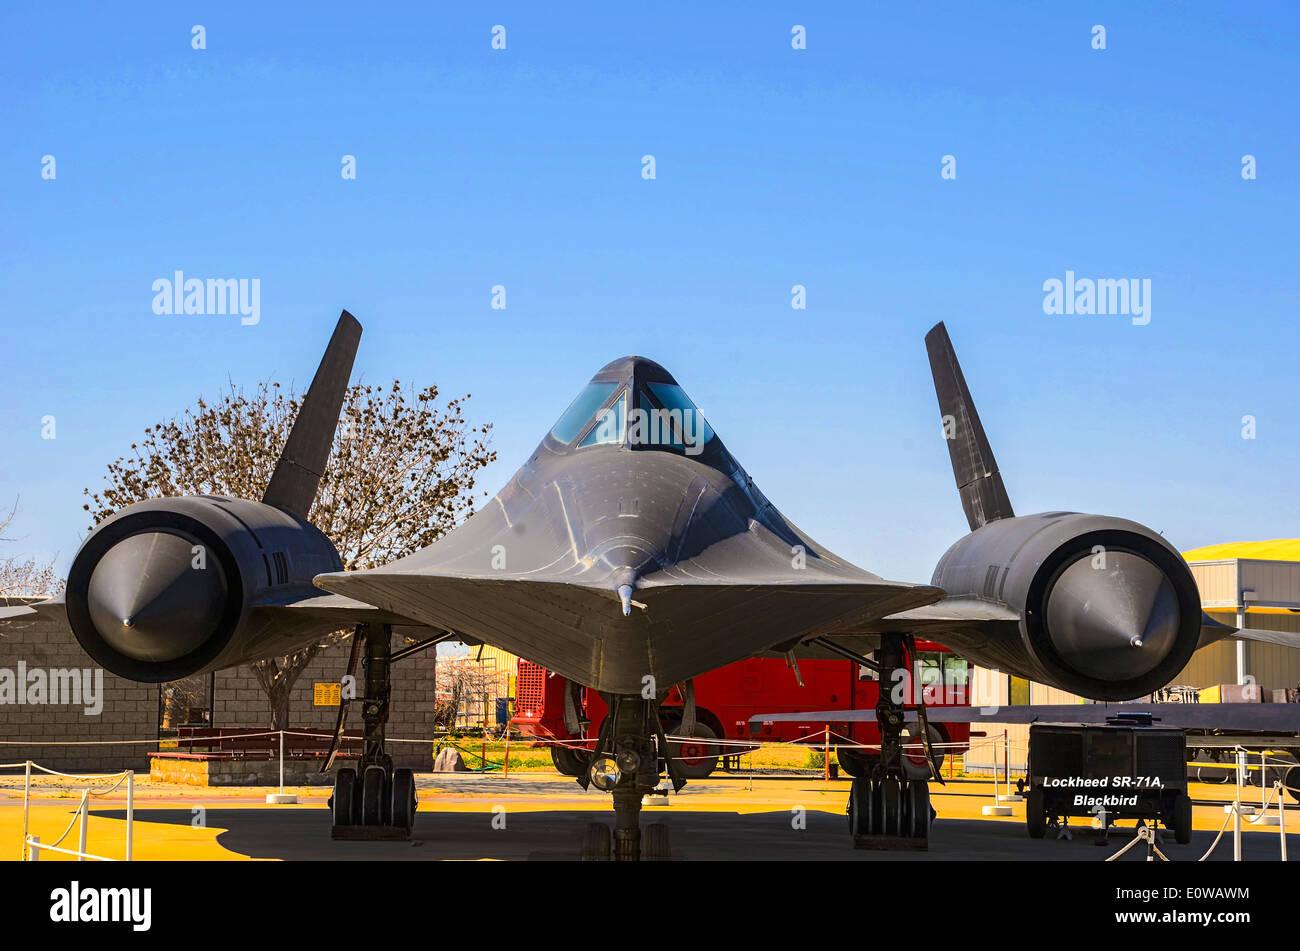 Lockheed SR-71A 'Blackbird' aircraft at The Blackbird Airpark near Palmdale,  California, USA. - Stock Image